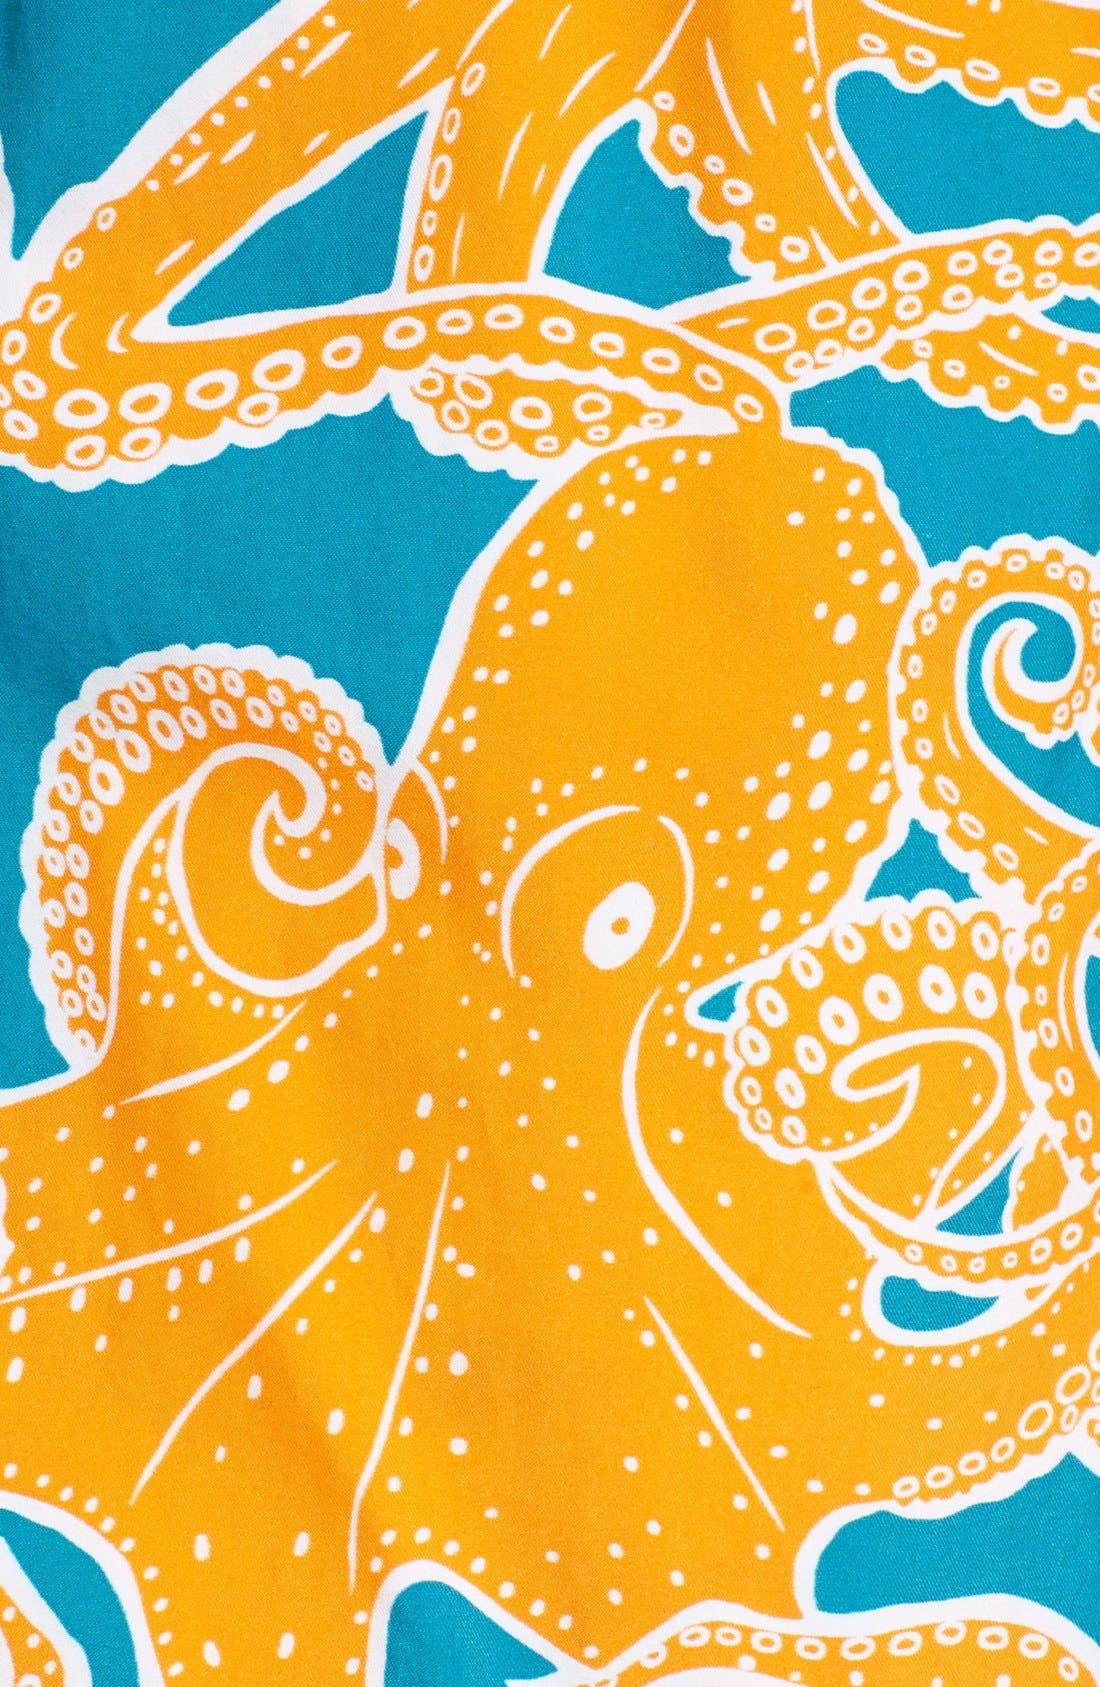 Octopus Print Swim Trunks,                             Alternate thumbnail 5, color,                             801